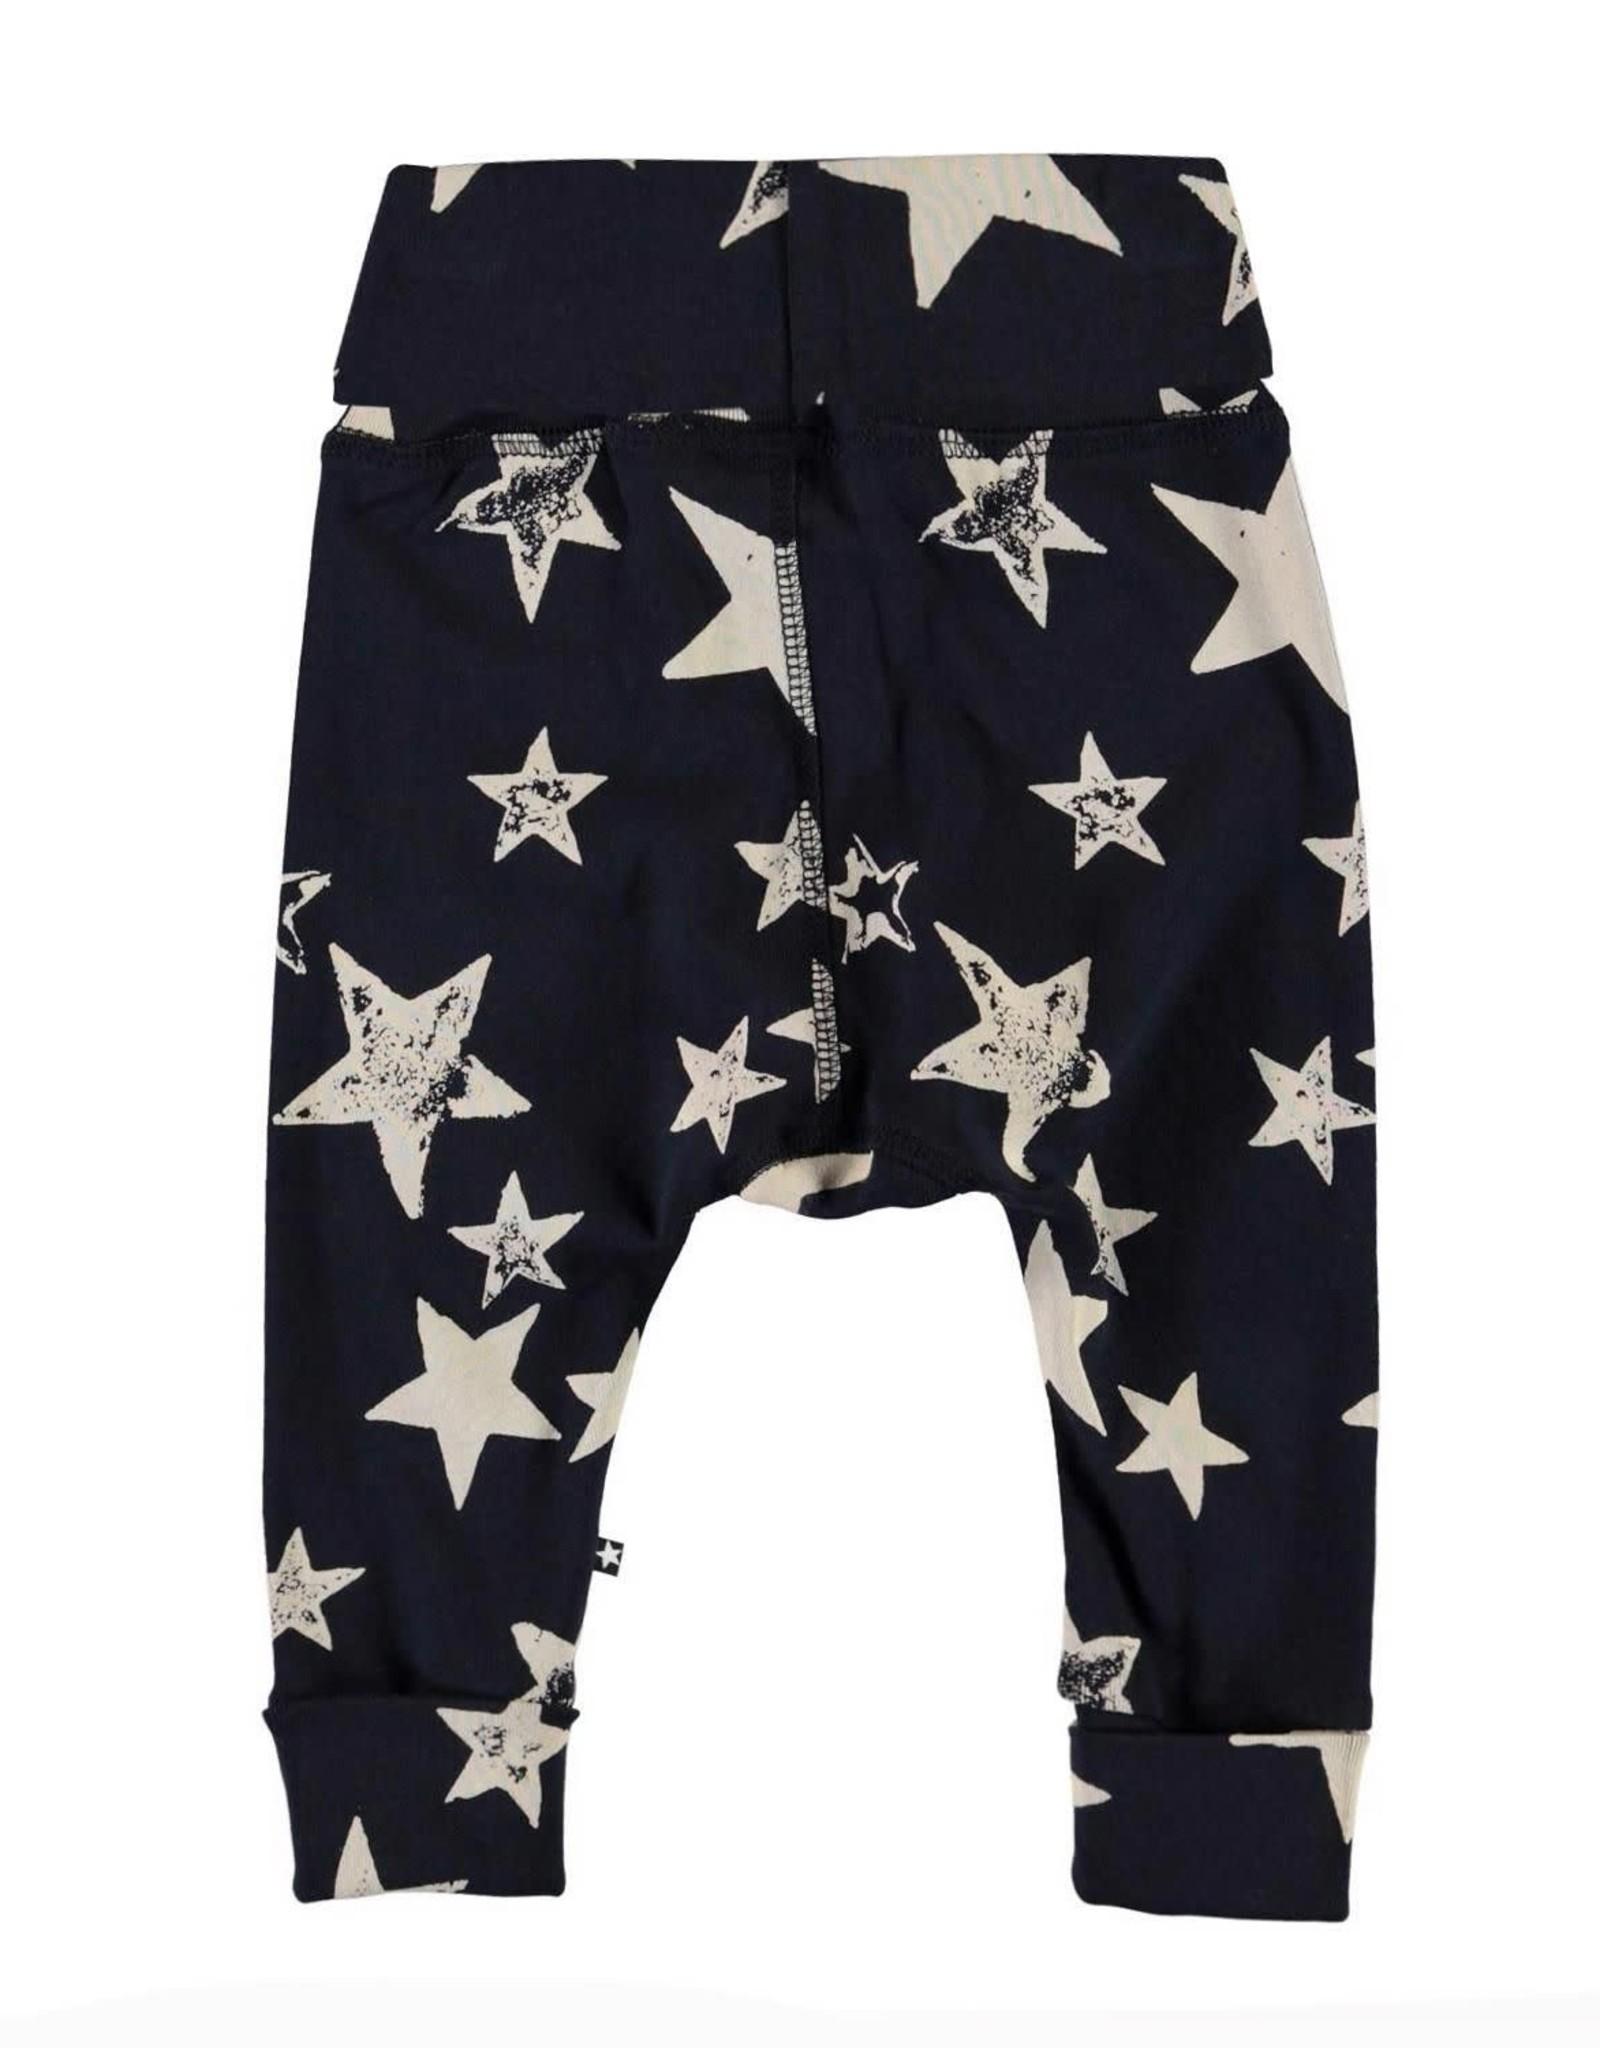 Molo Son White Navy Star Pants